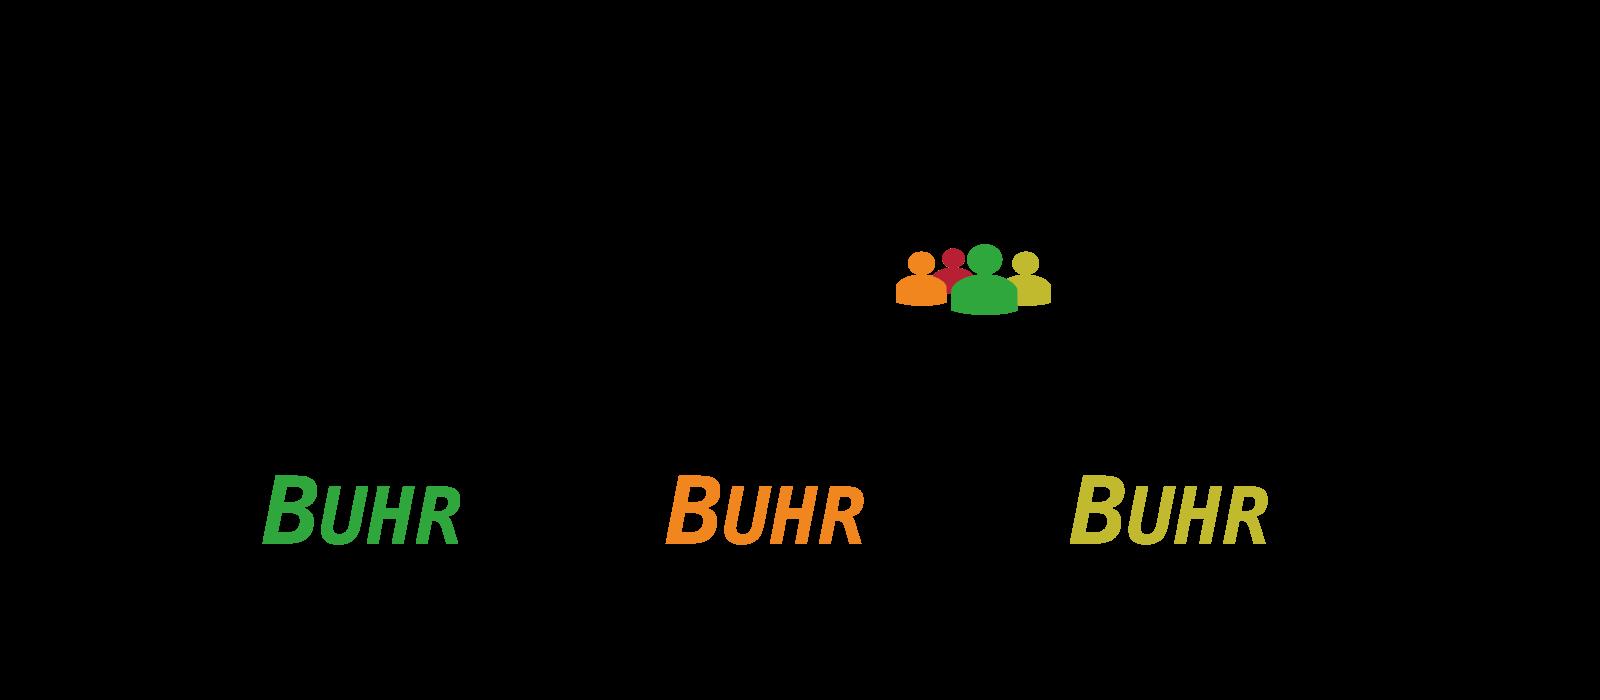 Agentur Goldkind Buhr Gruppe